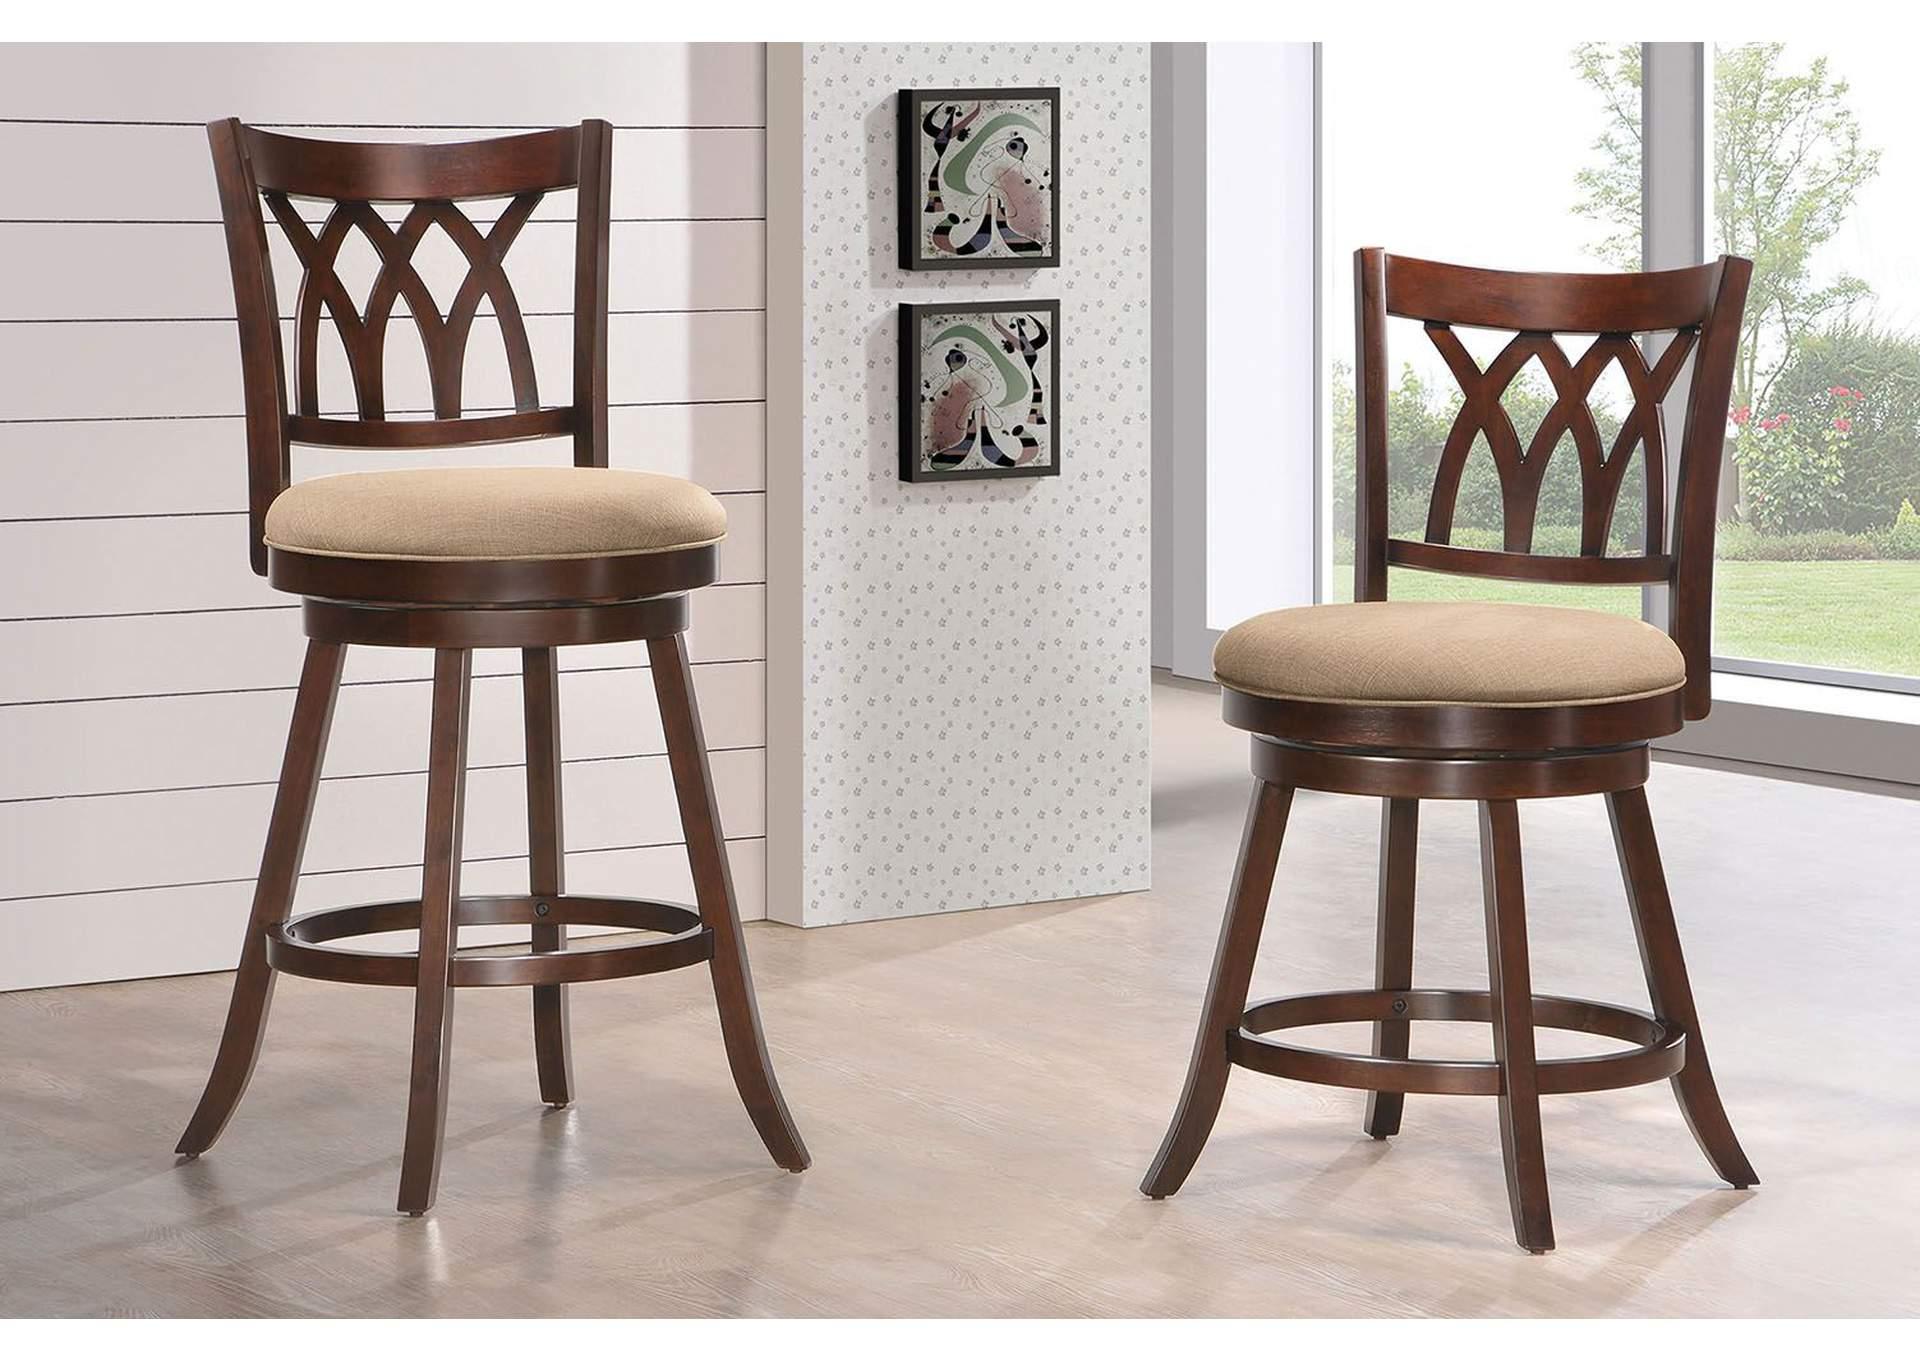 Tabib Fabric U0026 Espresso Counter Height Chair W/Swivel,Acme